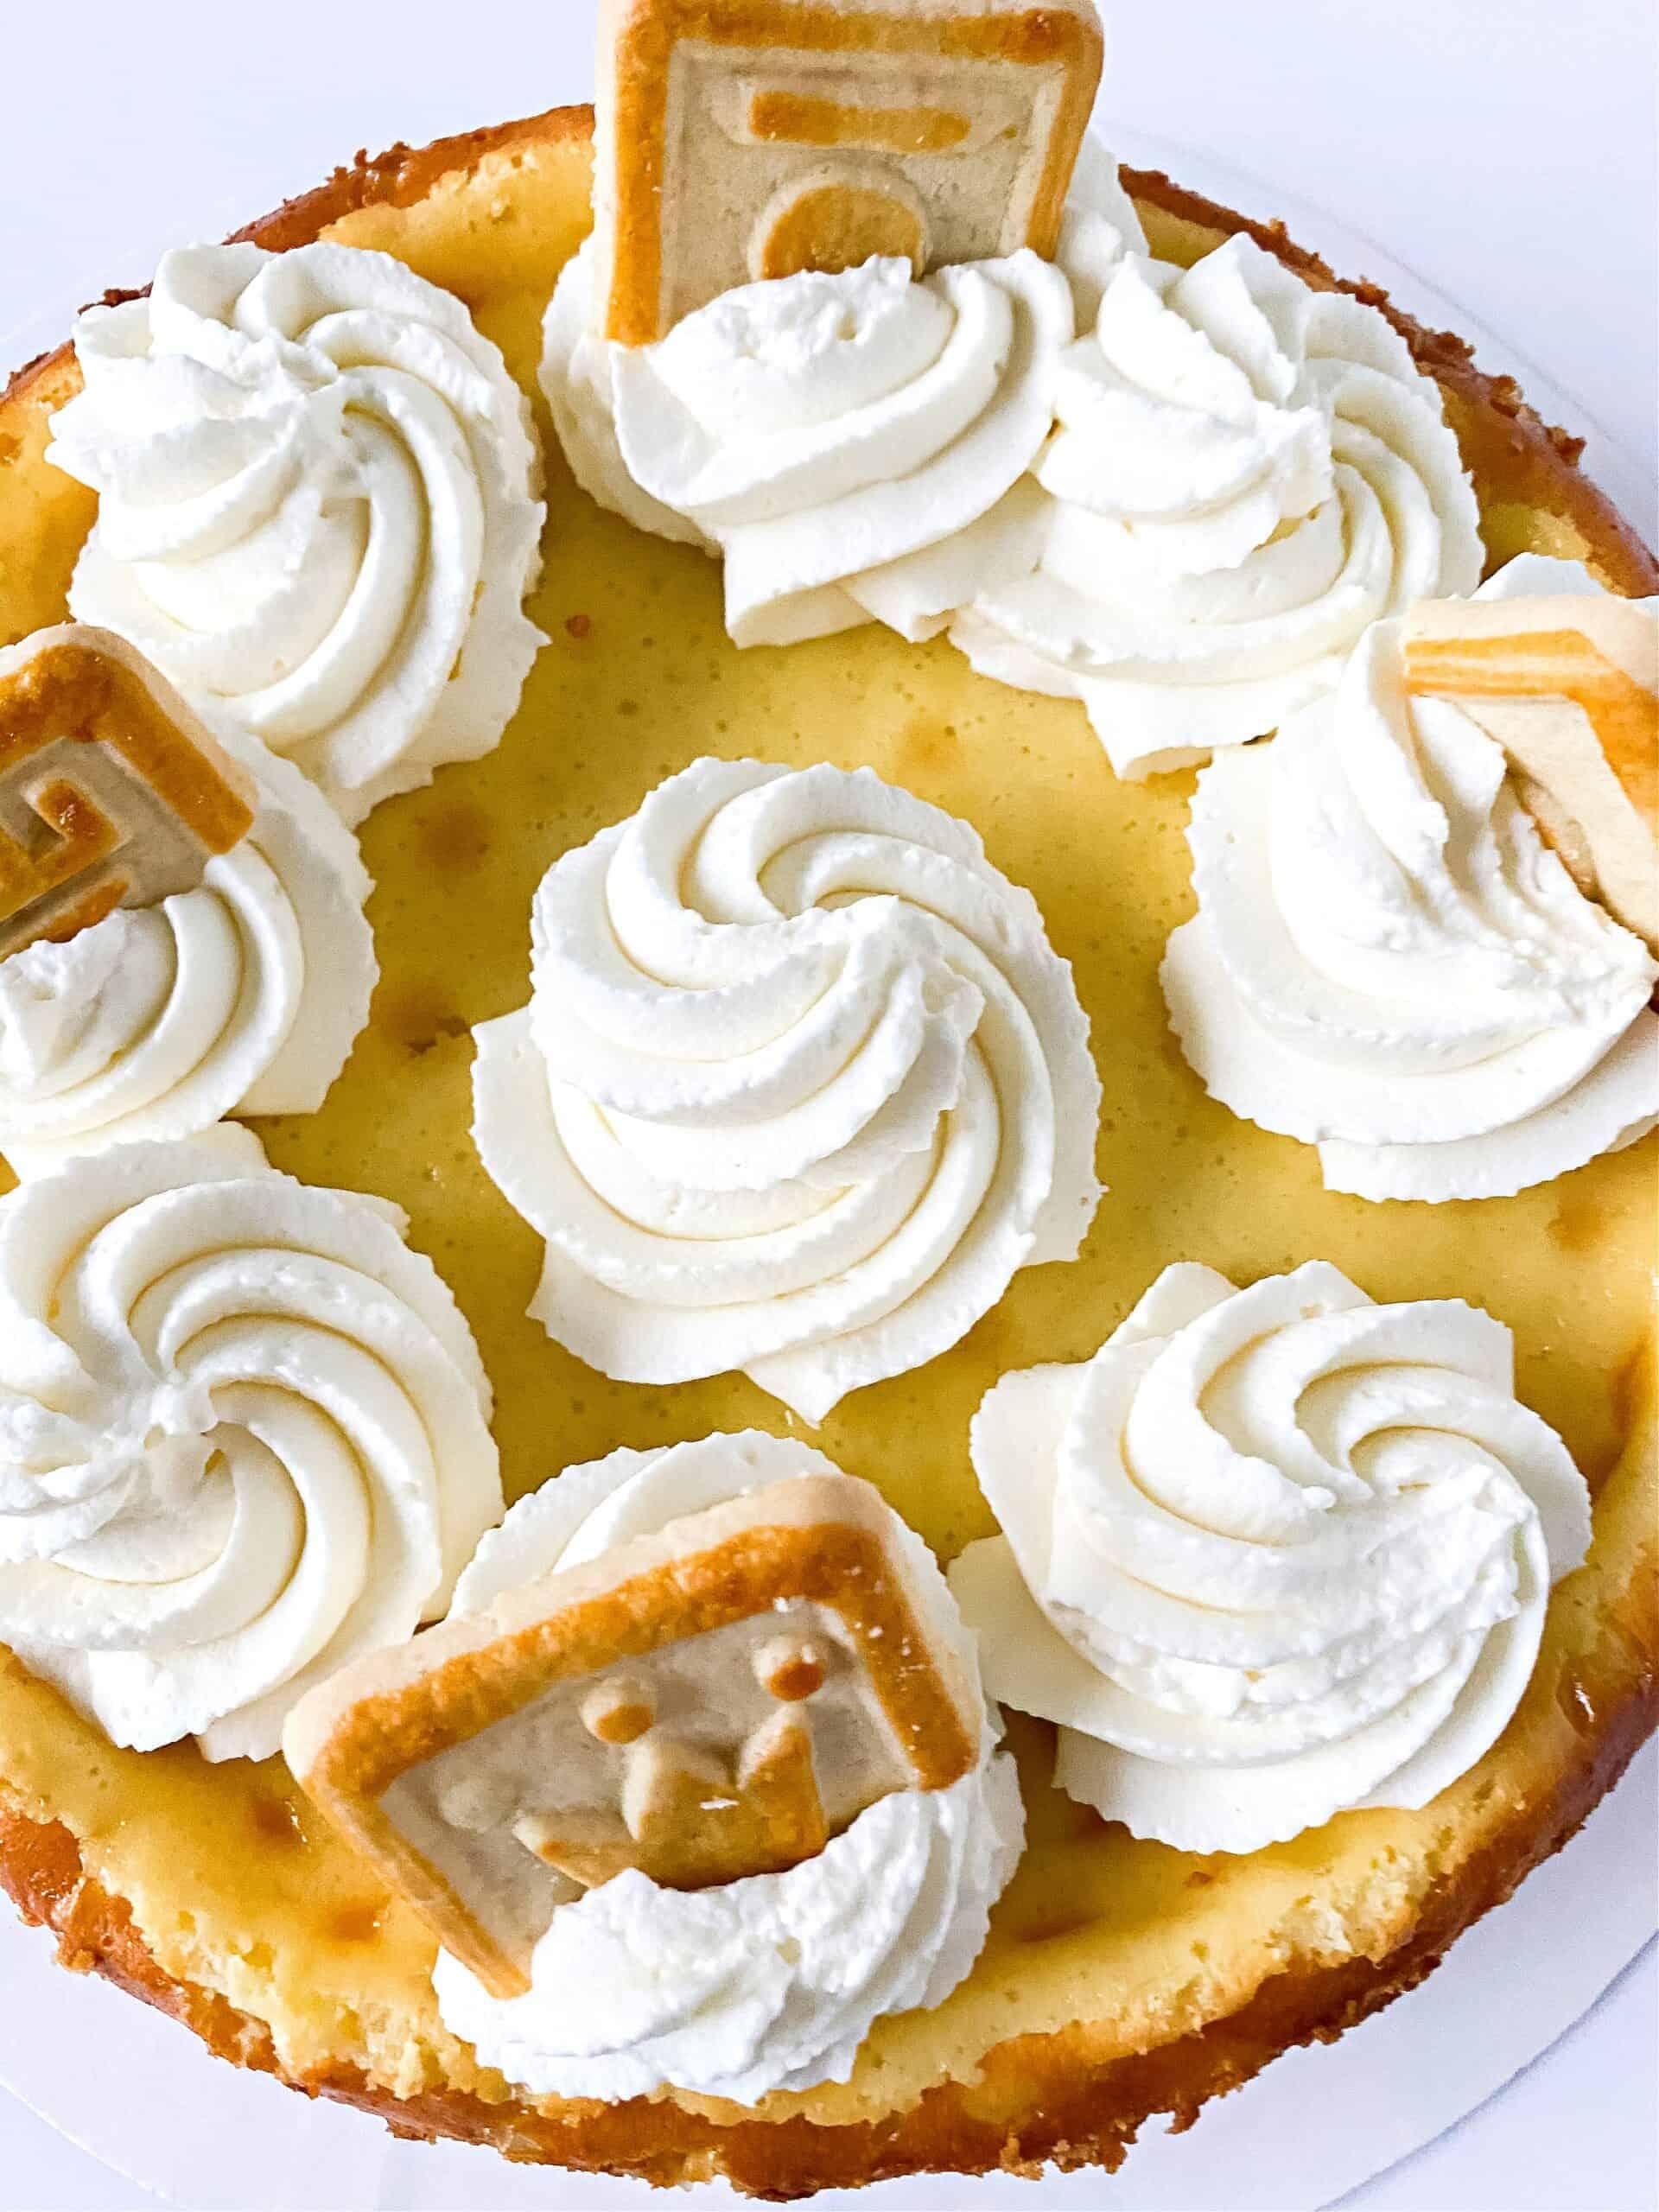 banana cheesecake with cookies